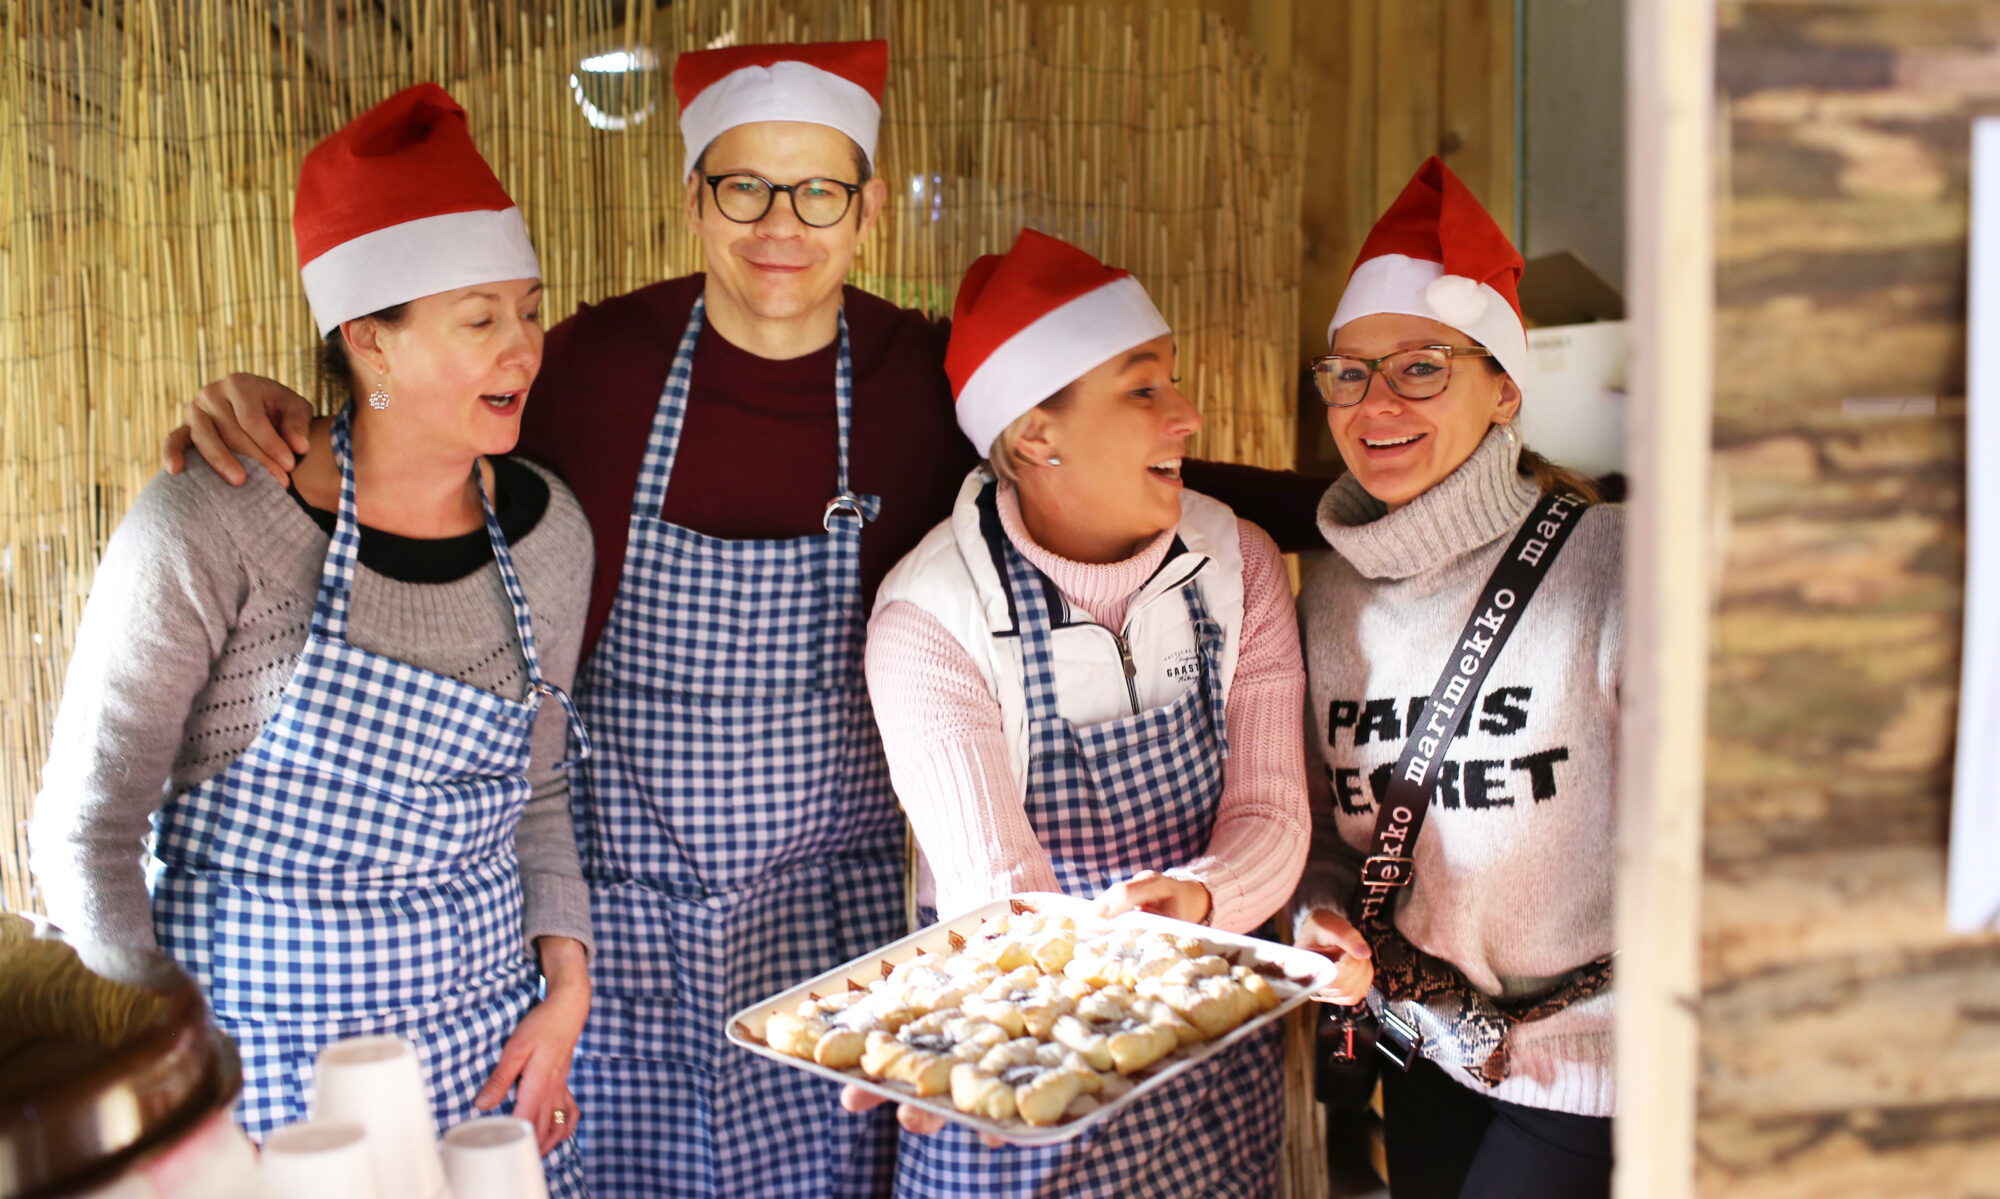 Hyvää joulua! Frohe Weihnachten wünscht das JoMa team. Bleibt Gesund!